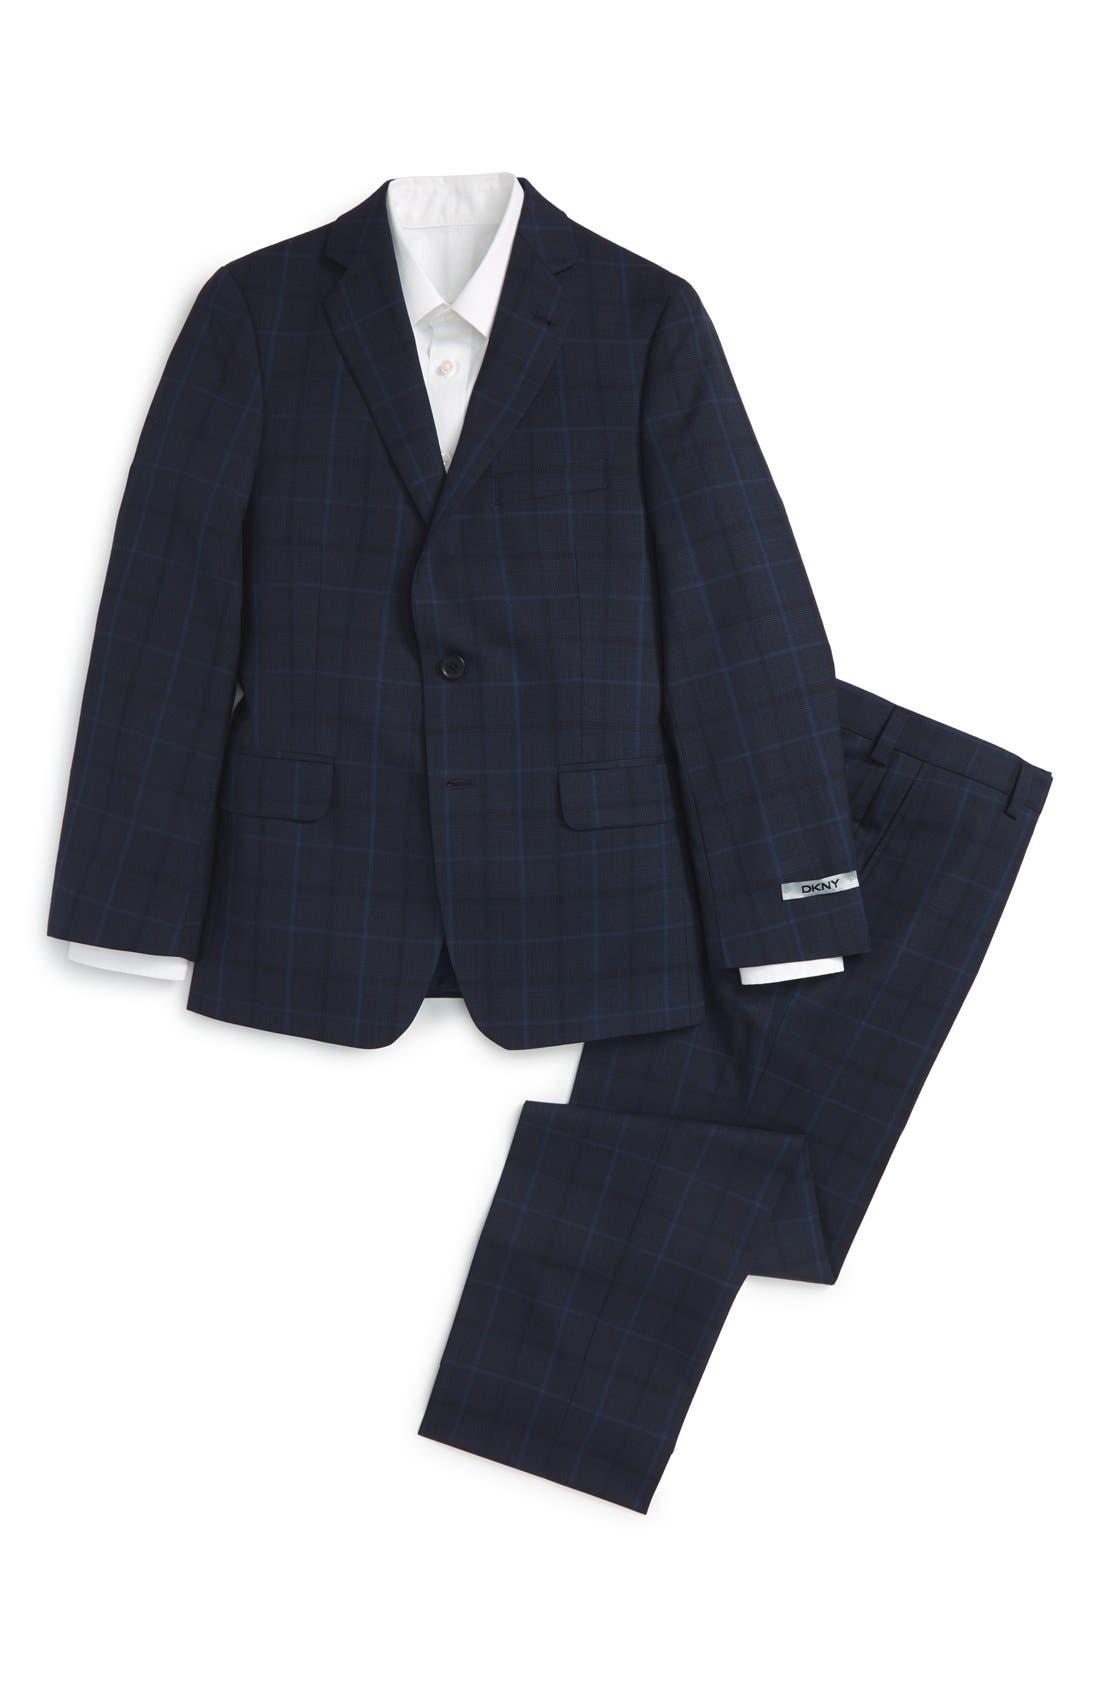 Alternate Image 1 Selected - DKNY Plaid Wool Suit (Big Boys)